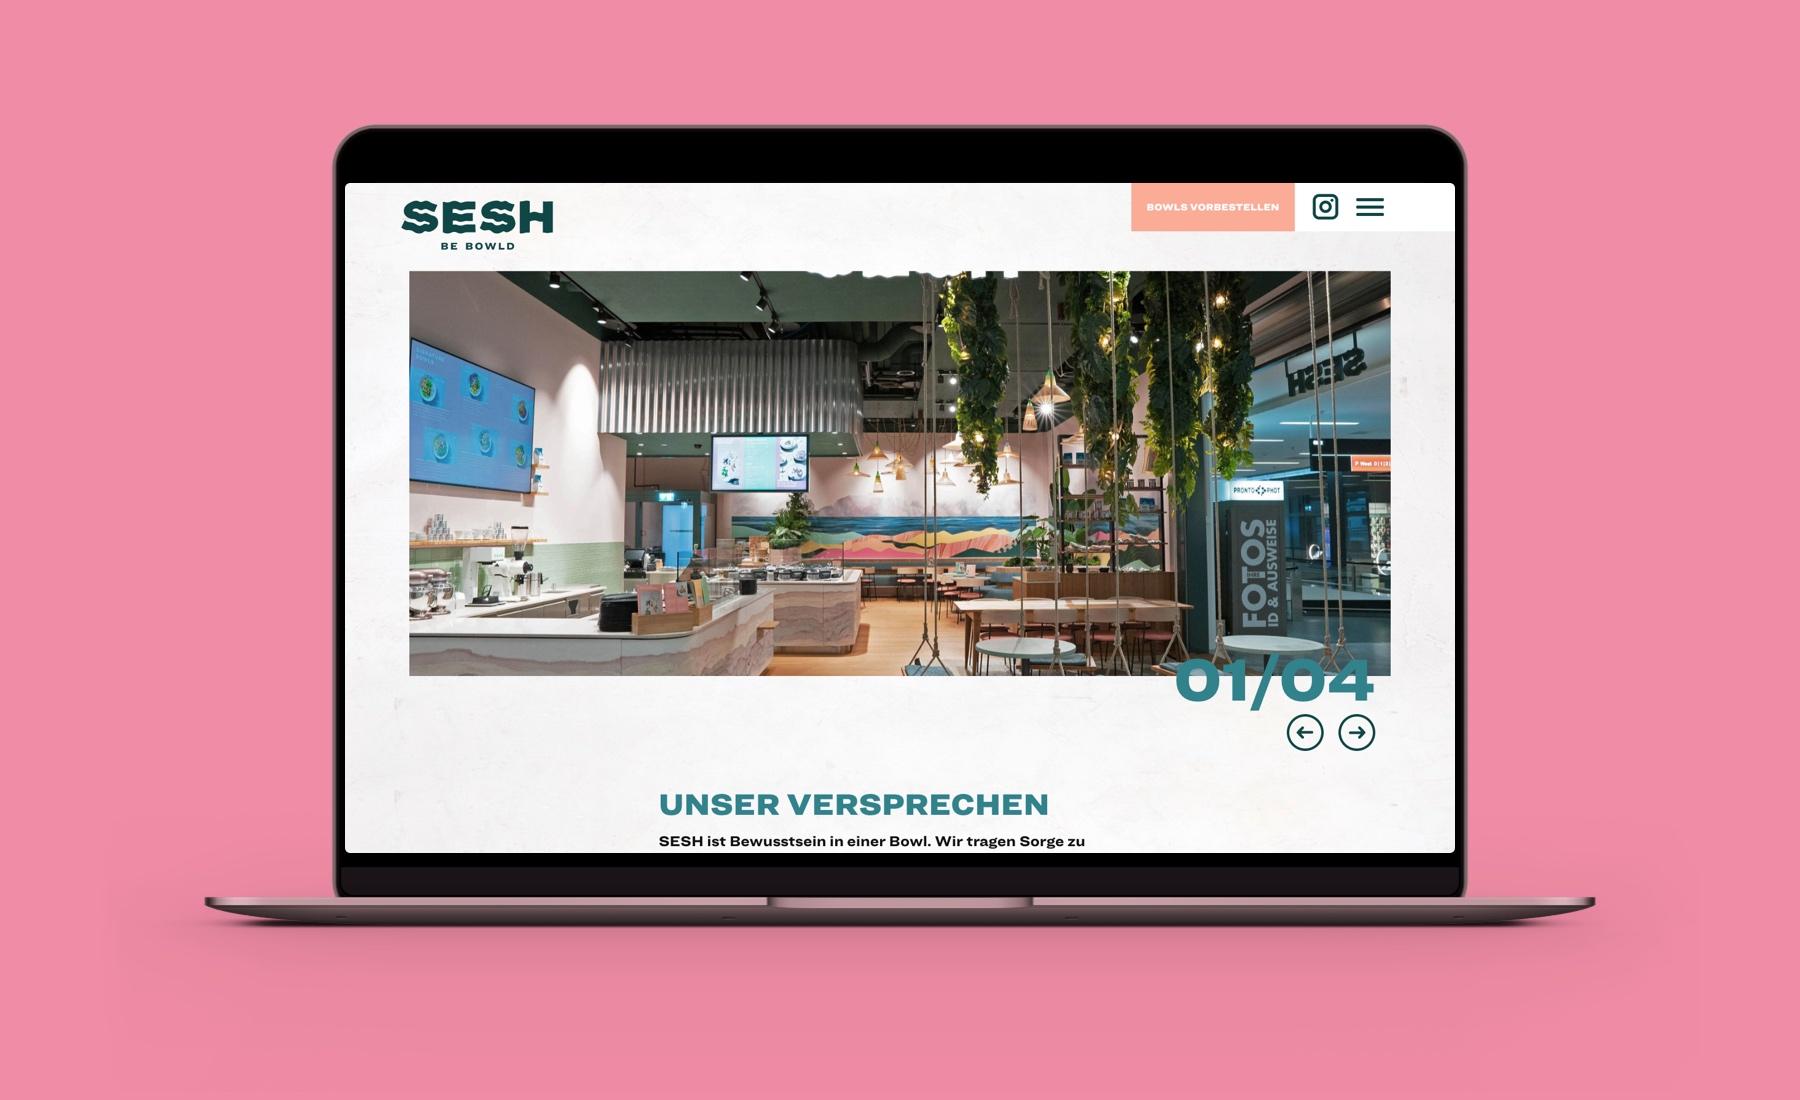 sesh-web-slider-macbook-4